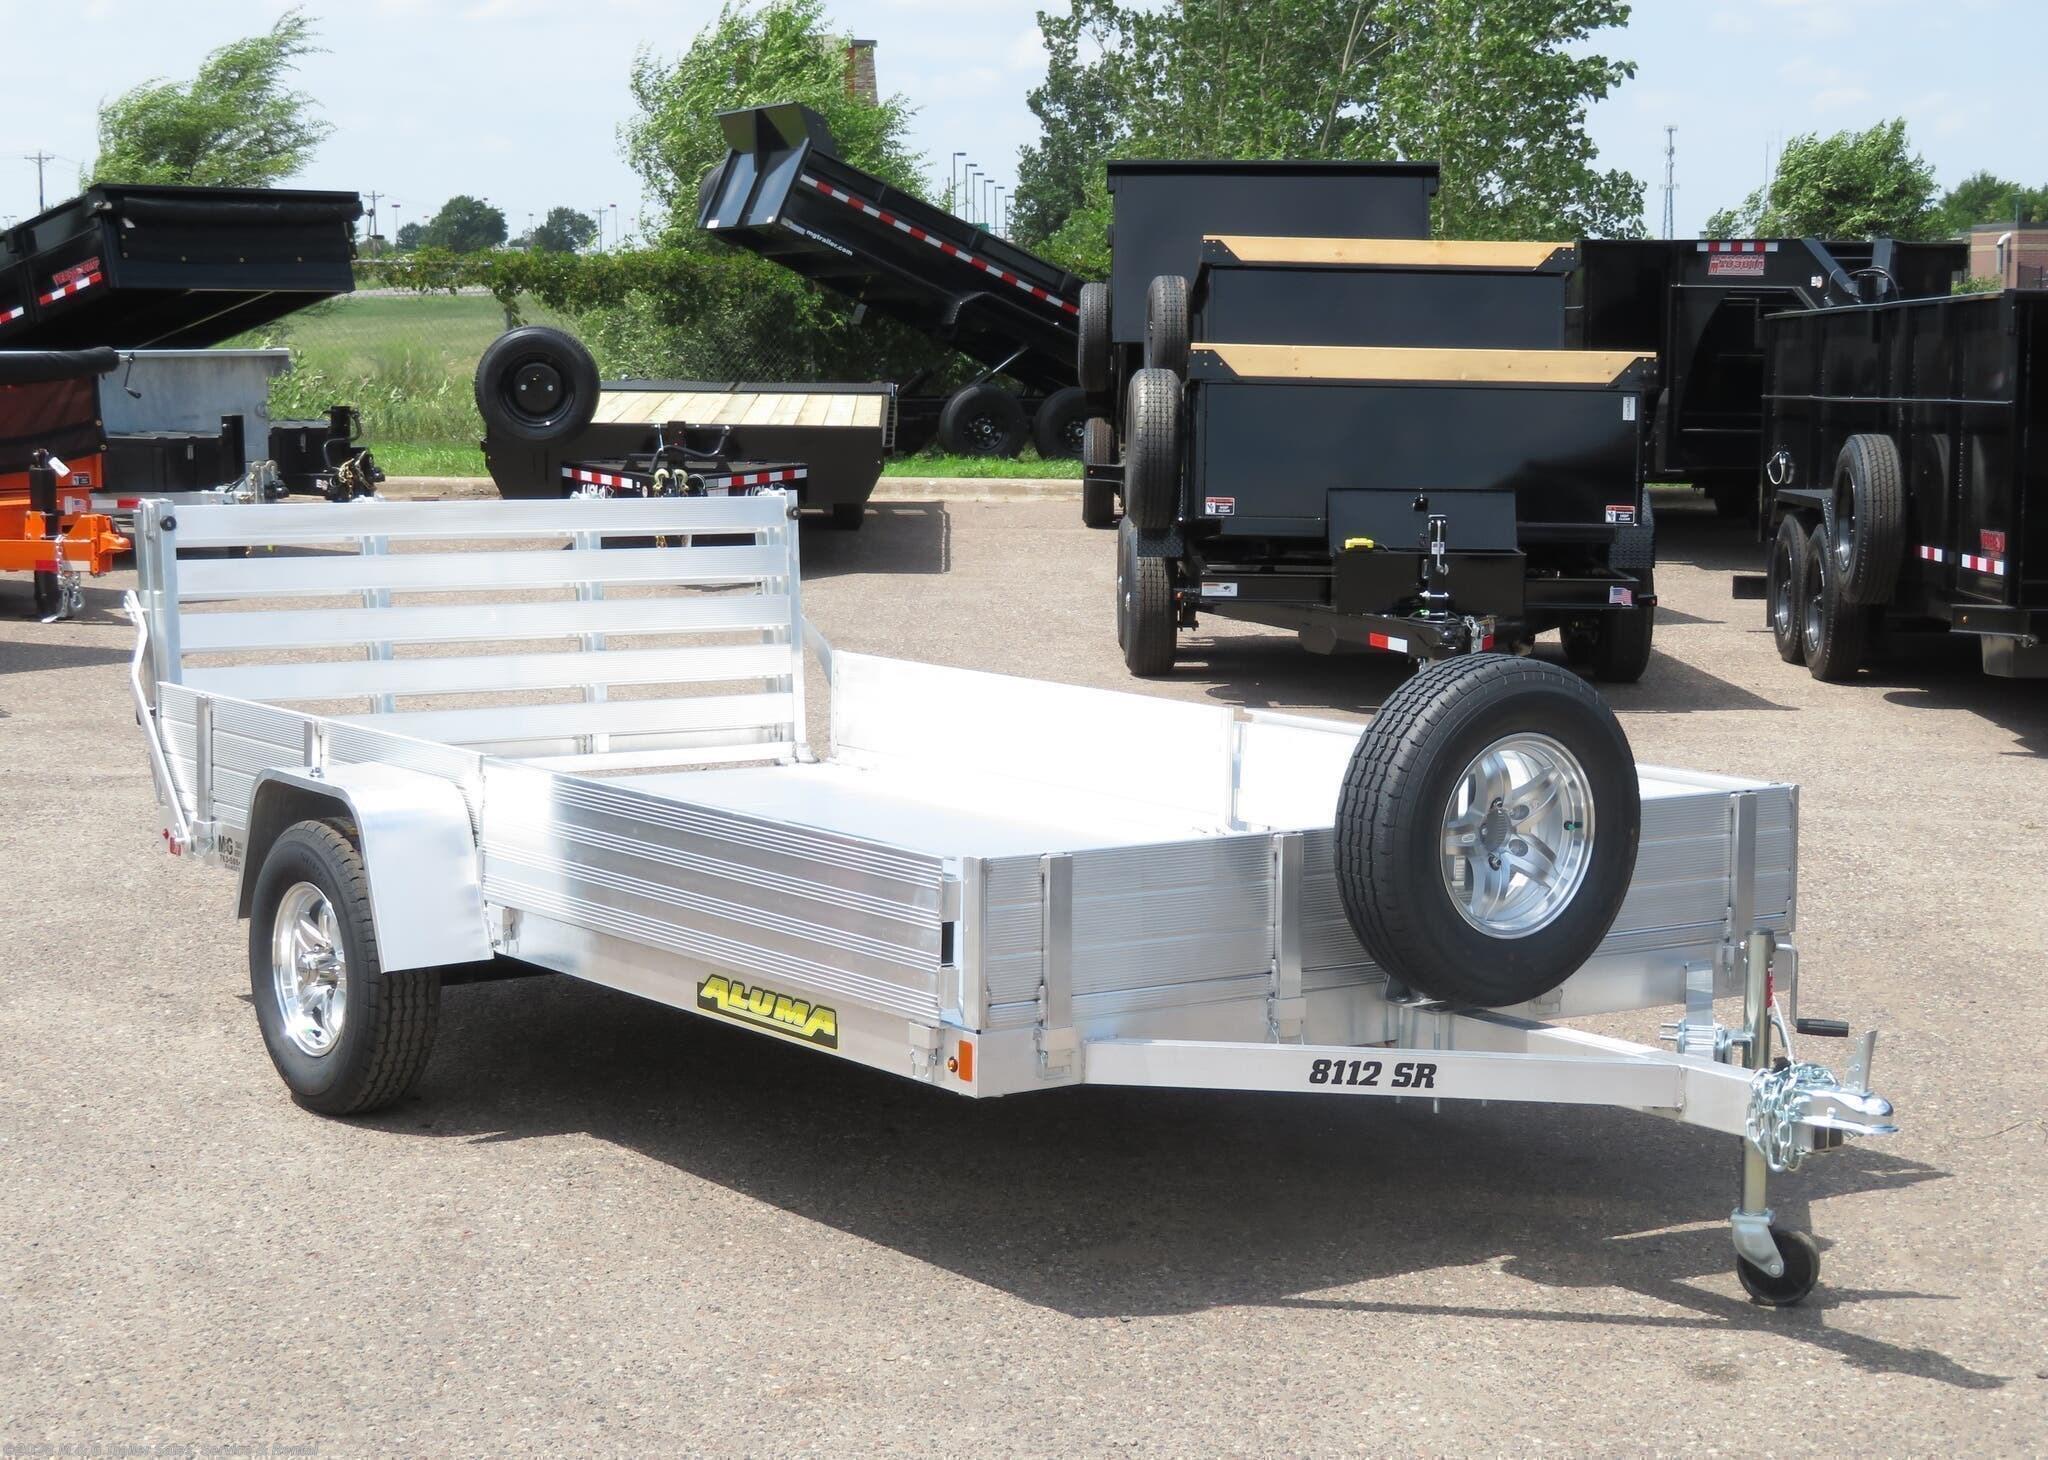 2021 Aluma 8112 SR Aluminum ATV/Utility Trailer - Stock #227170